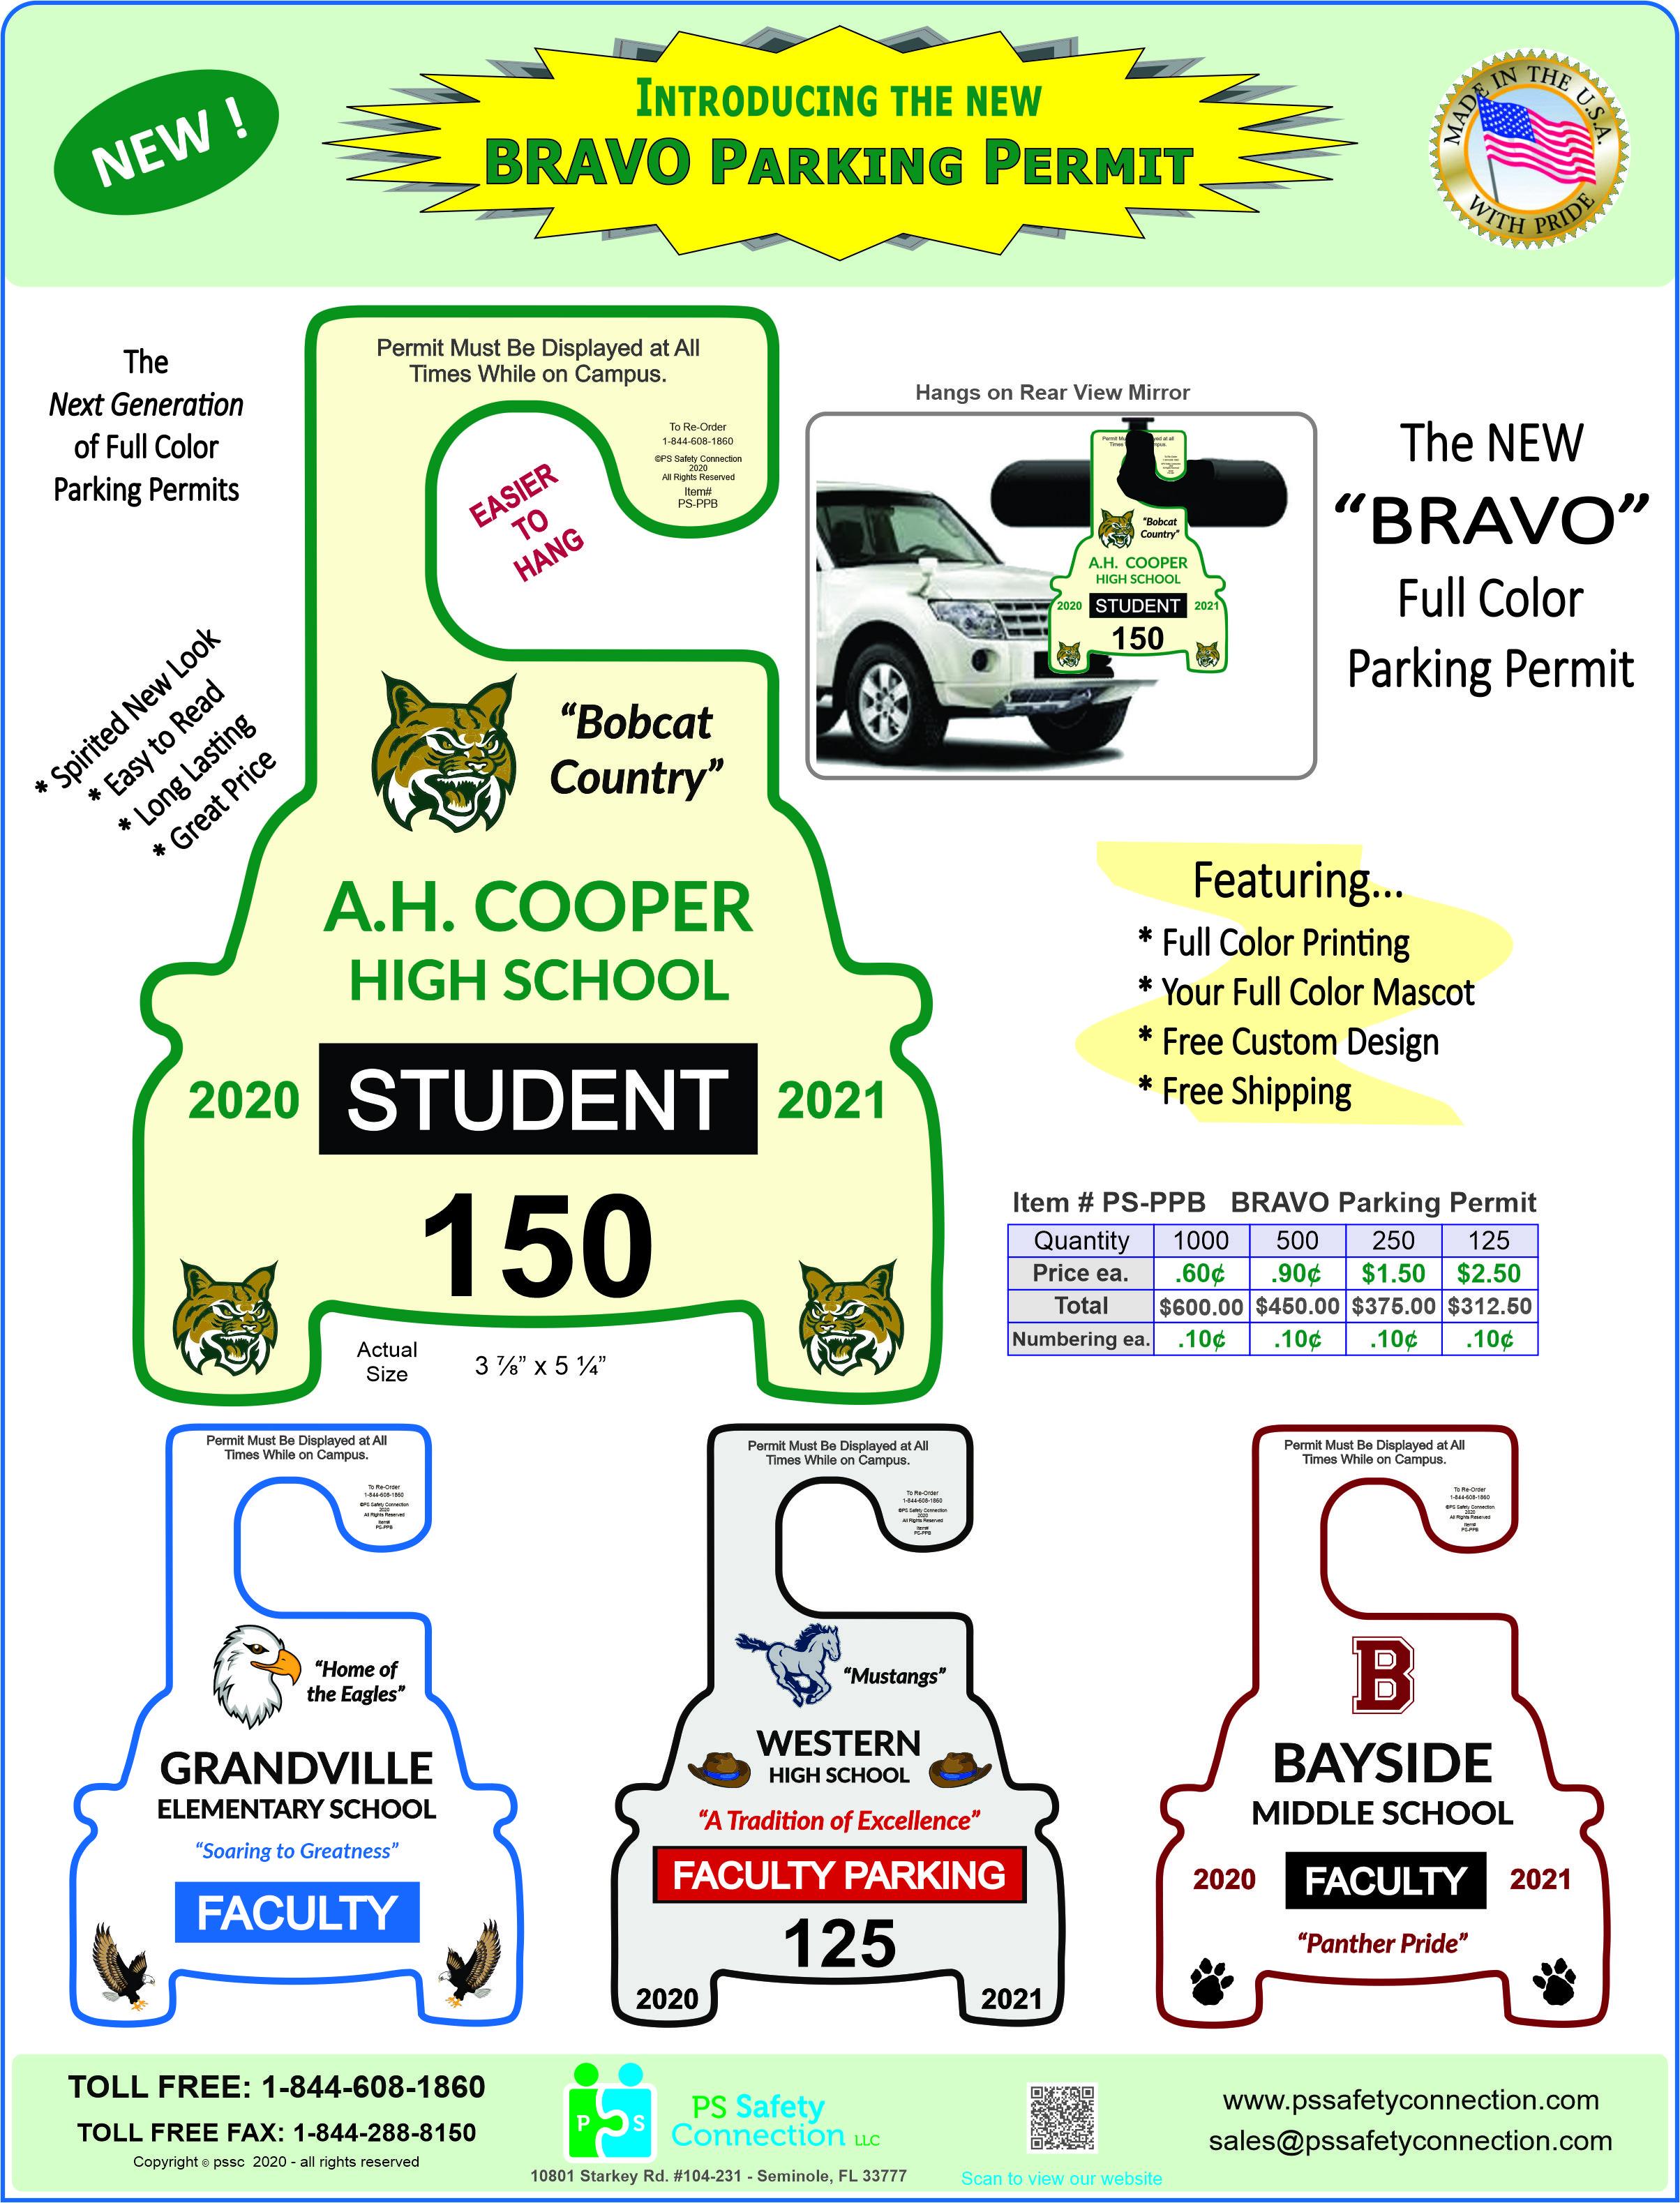 BRAVO Parking Permit